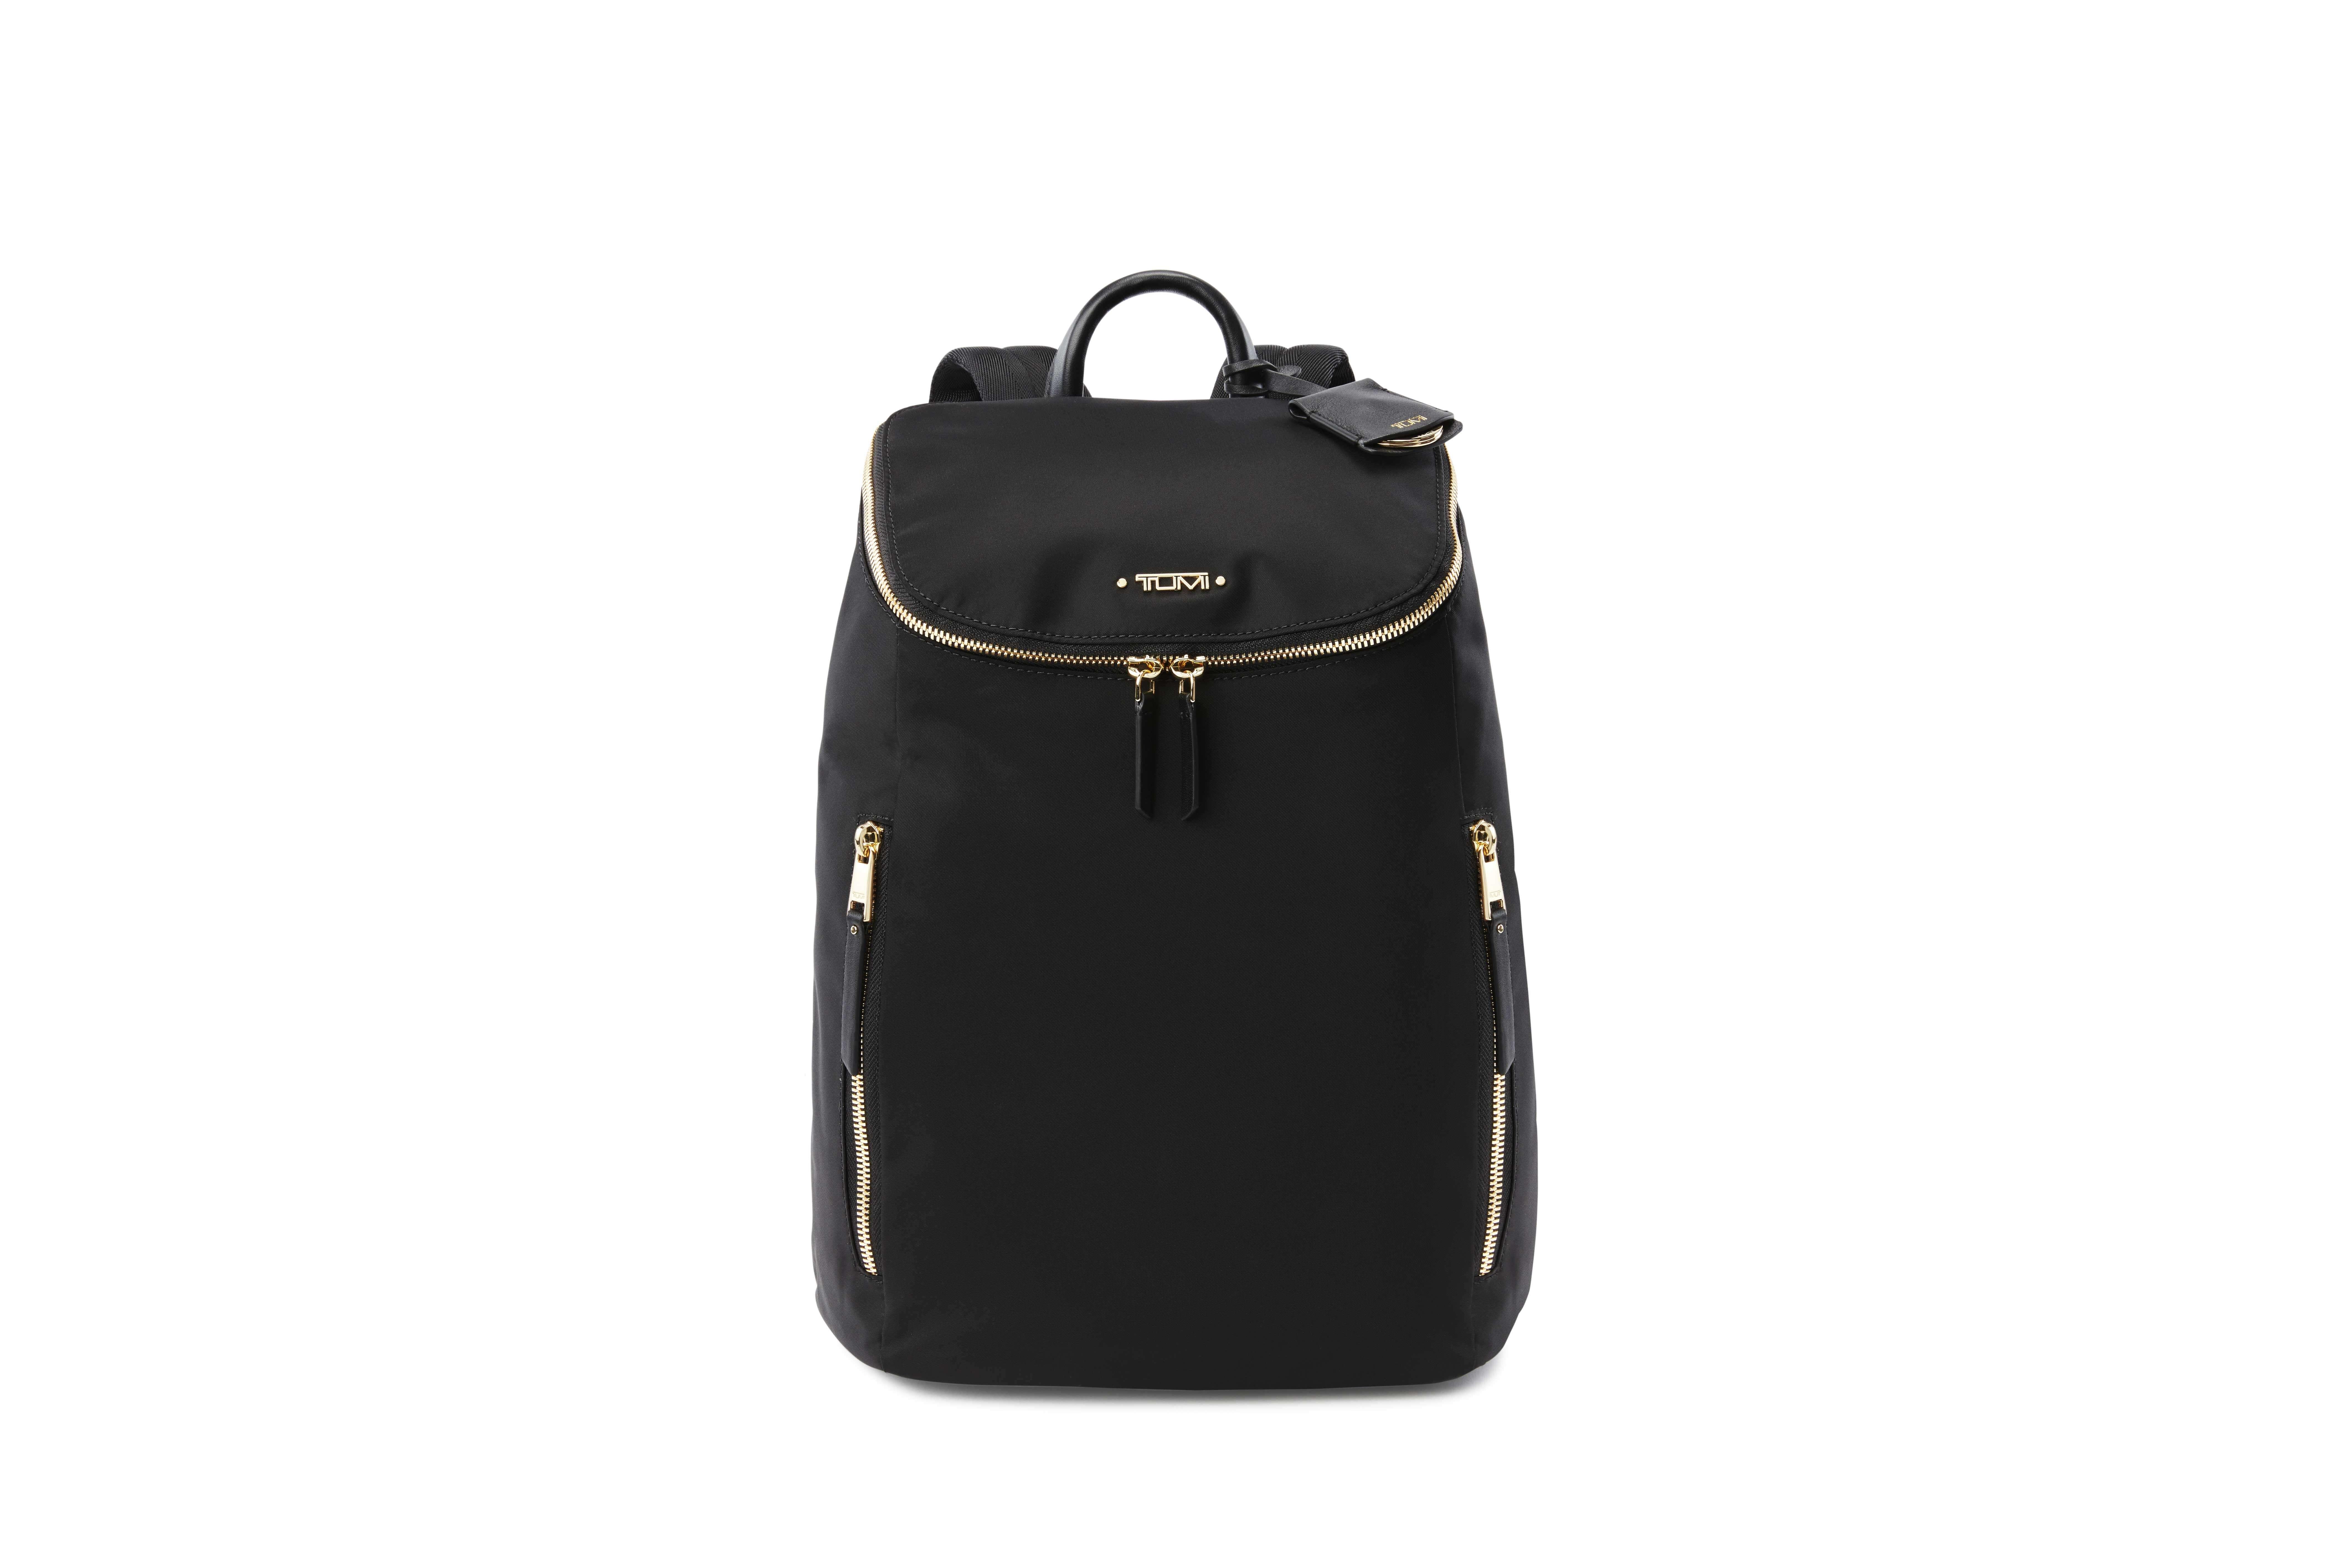 TUMI Voyageur Bryce Backpack